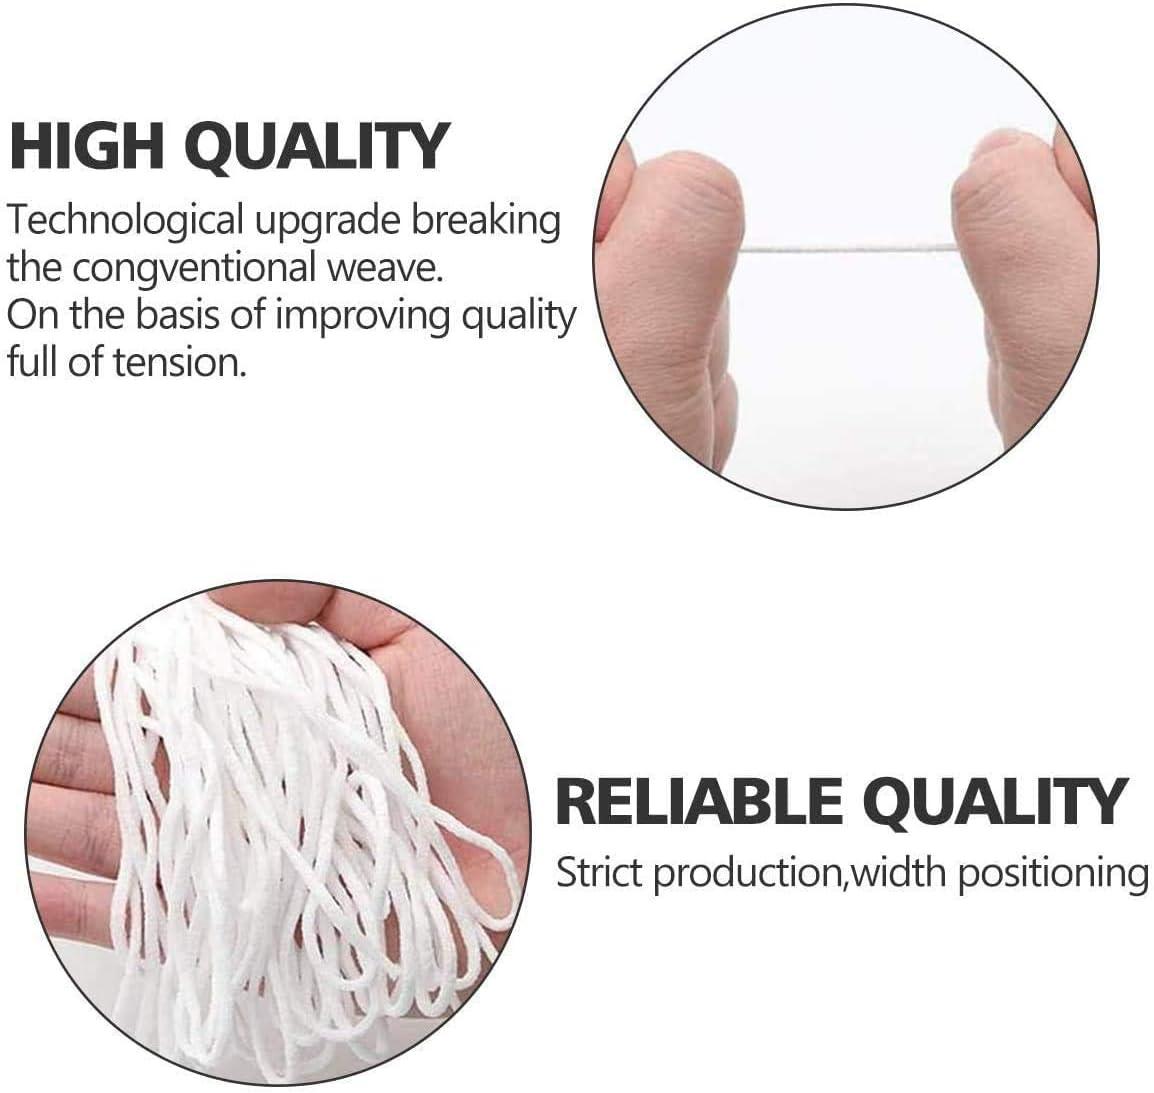 Elastic Cord for Sewing ATORX 1//4 inch Elastic Cord 10 Yard 10m 4mm Elastic Rope Heavy Stretch High Elasticity for Sewing Stretch Craft DIY